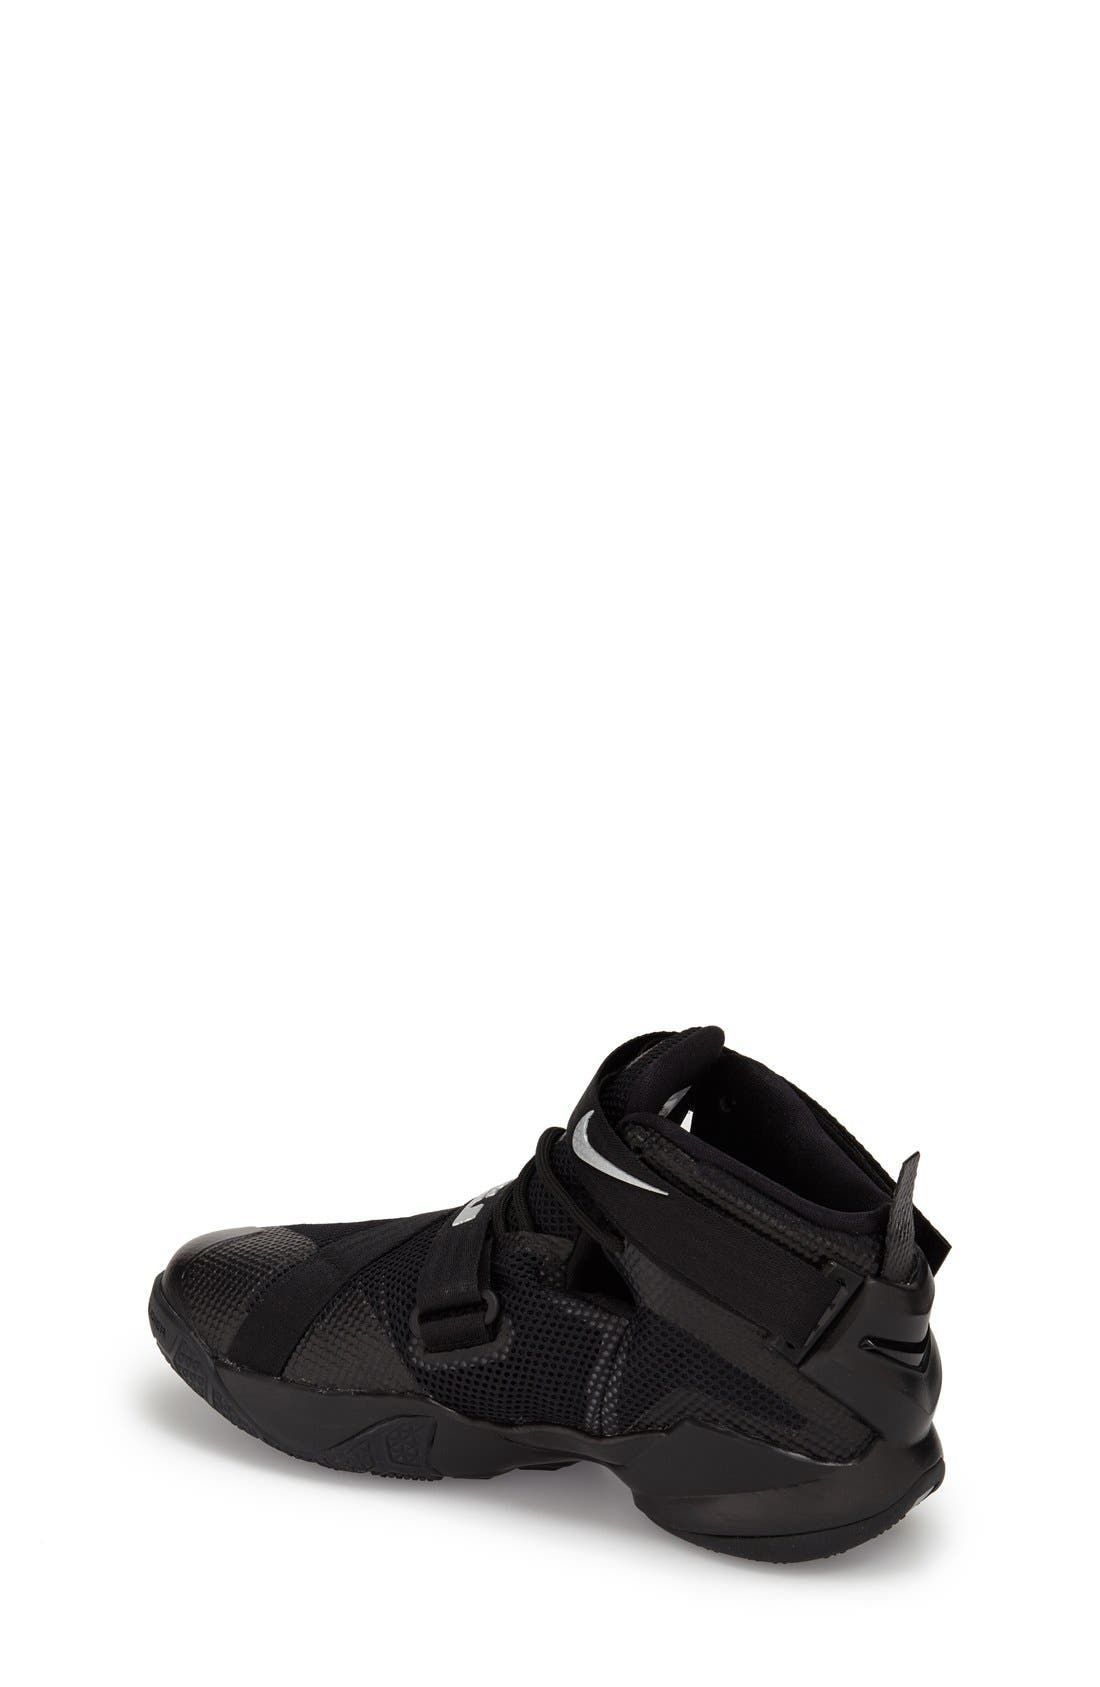 'LeBron Soldier 9' Basketball Shoe,                             Alternate thumbnail 4, color,                             001